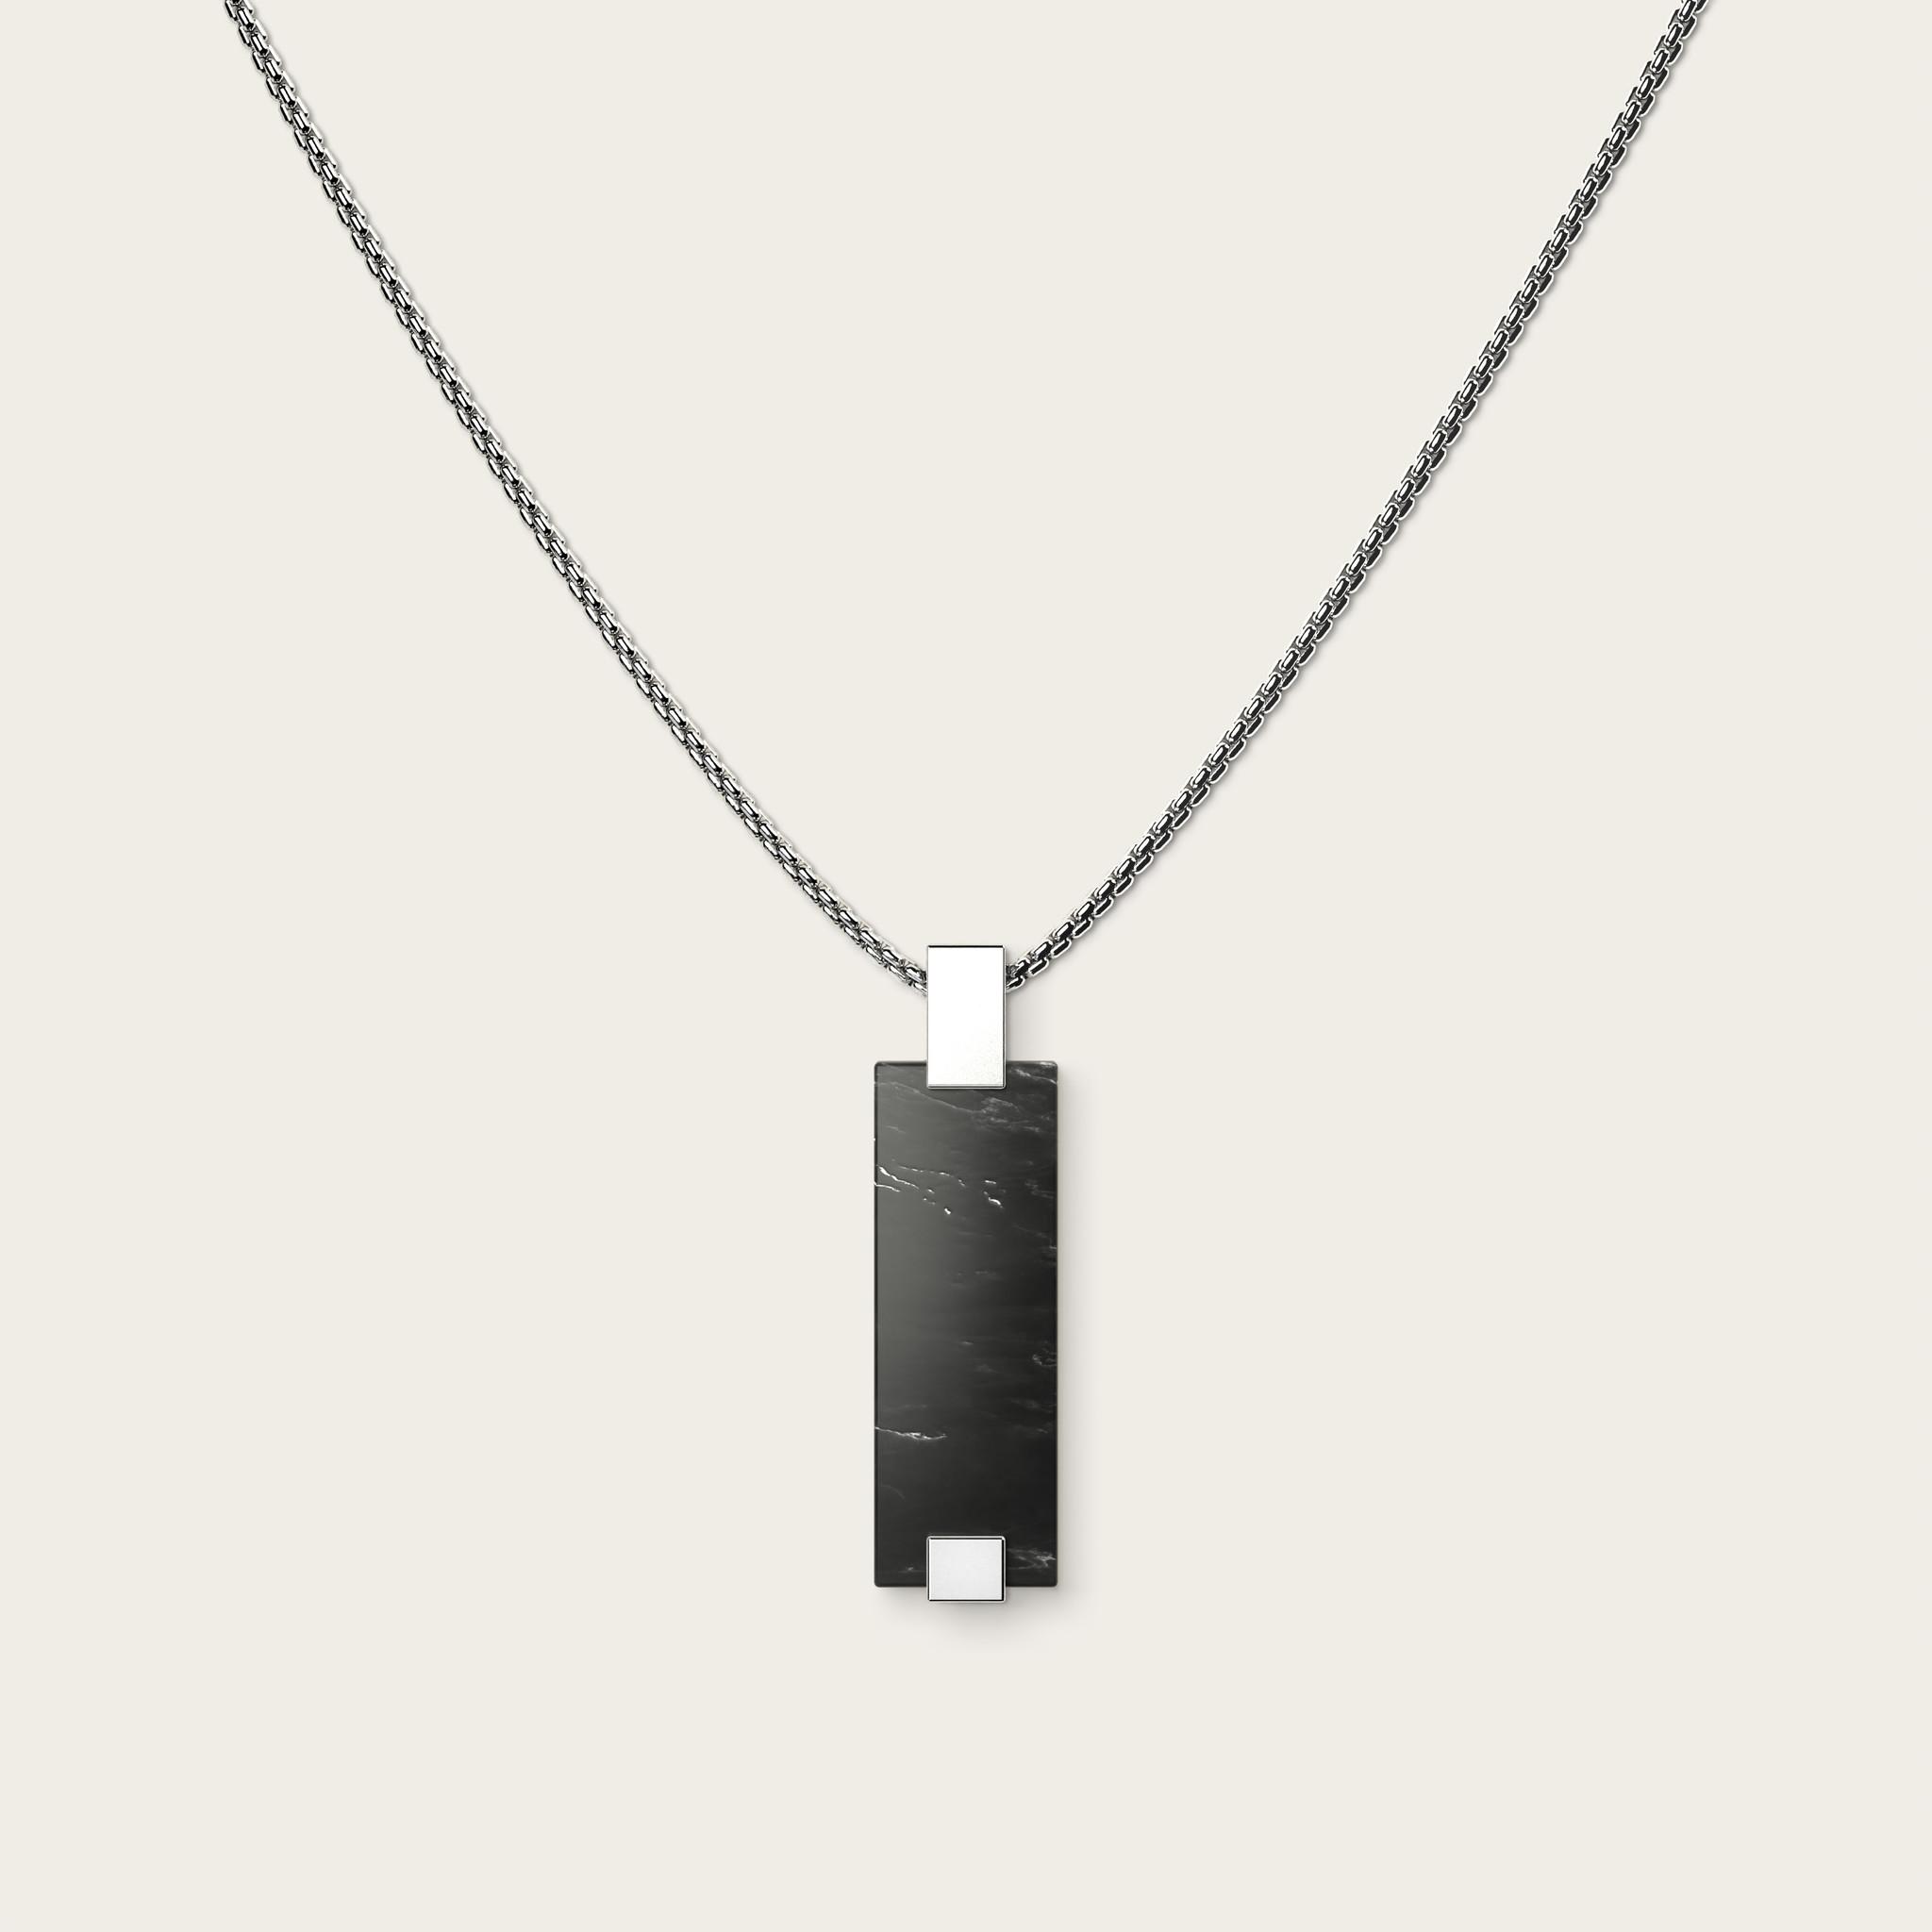 Vertical Black Marble & Silver